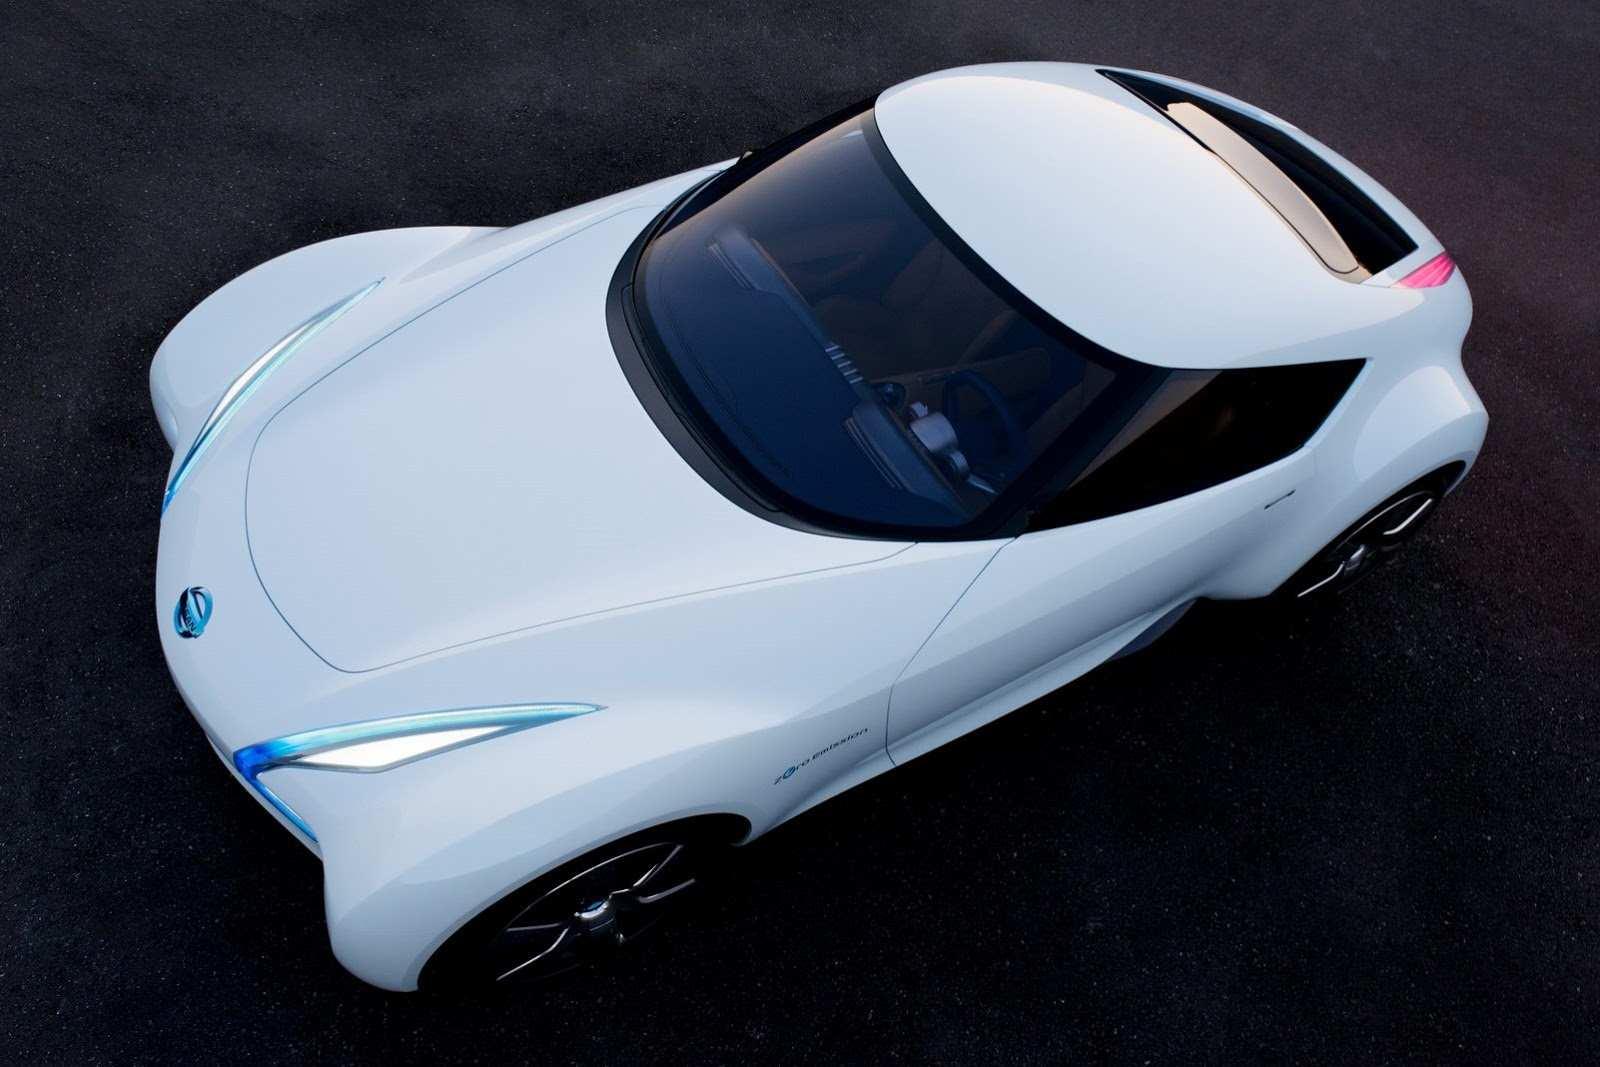 15 New New Nissan Z35 Model with New Nissan Z35